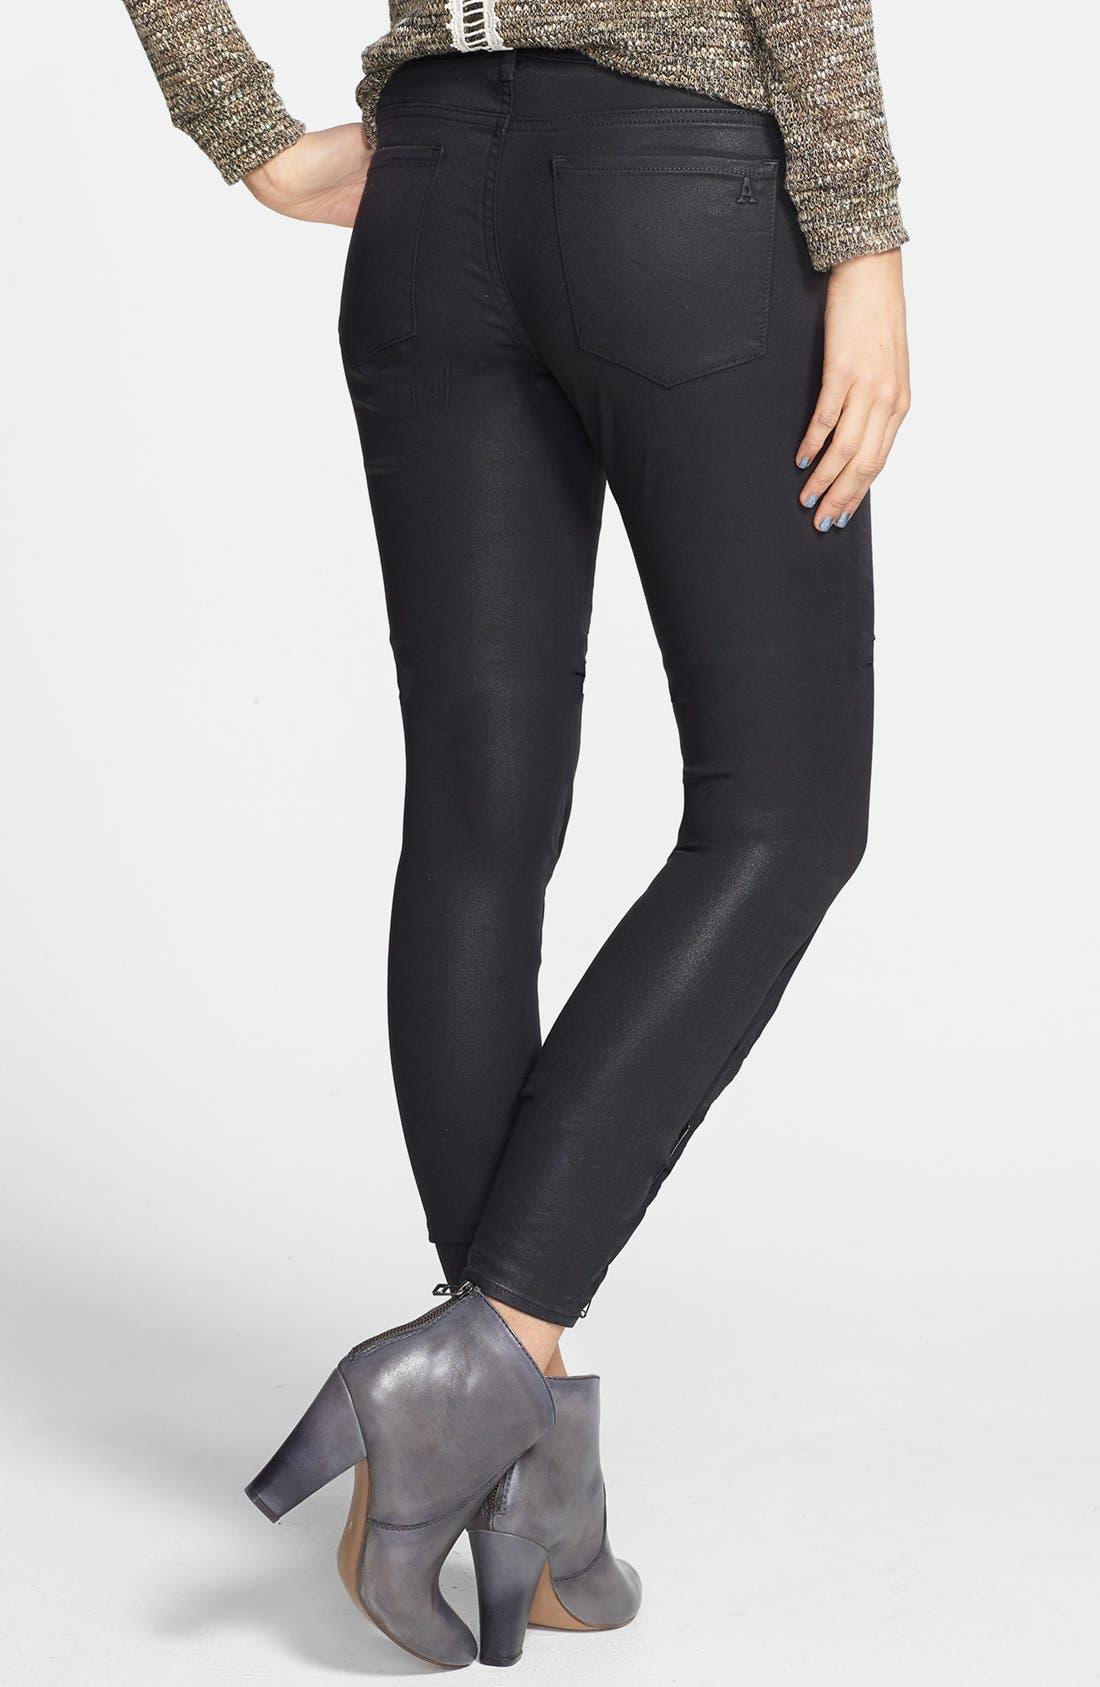 Alternate Image 2  - Articles of Society 'Mya' Coated Skinny Jeans (Moto)